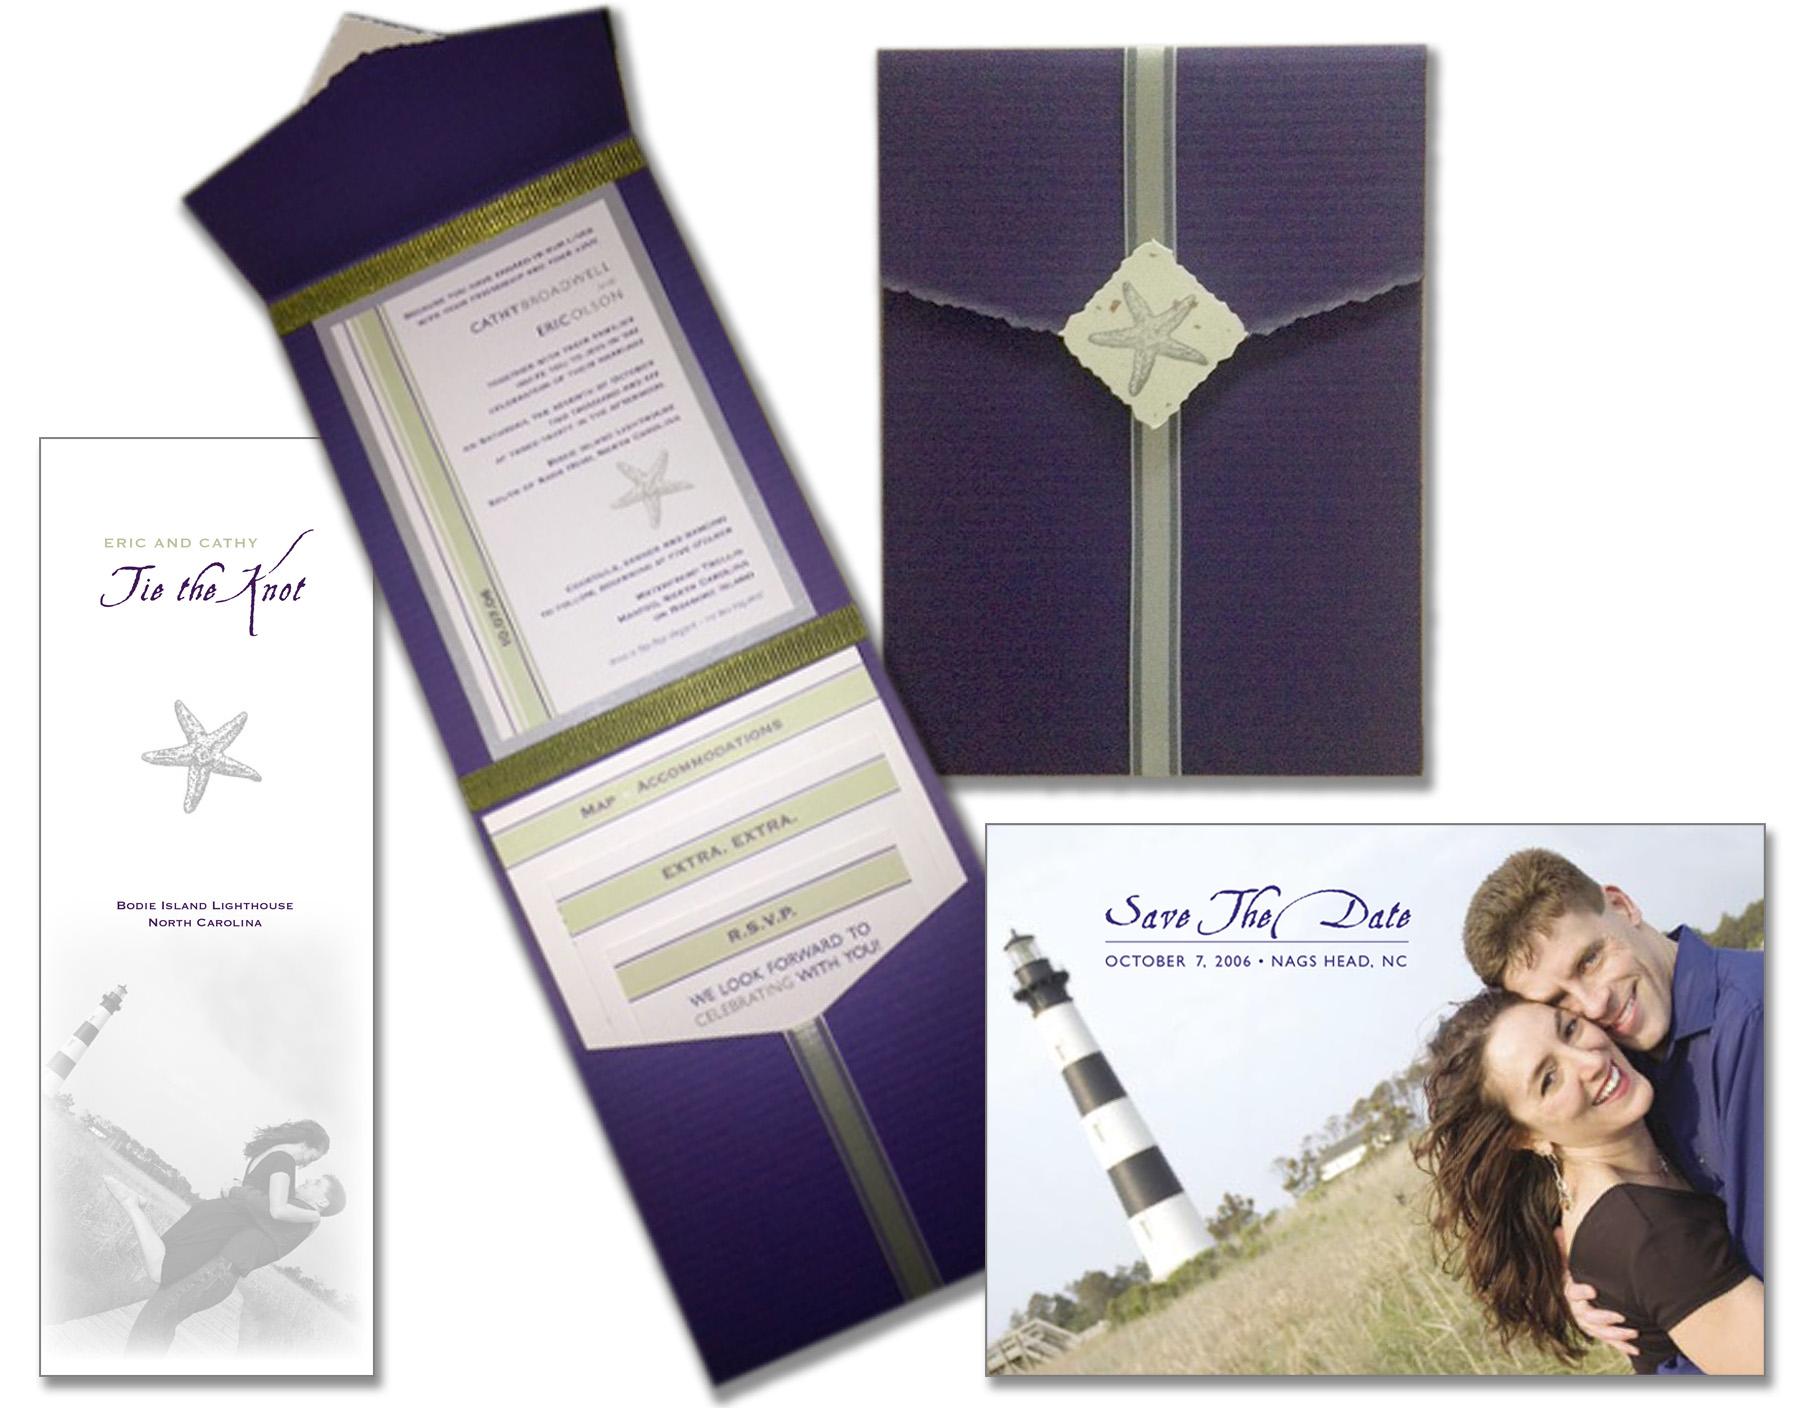 Eric Olson & Cathy Broadwell Wedding Invite & Materials